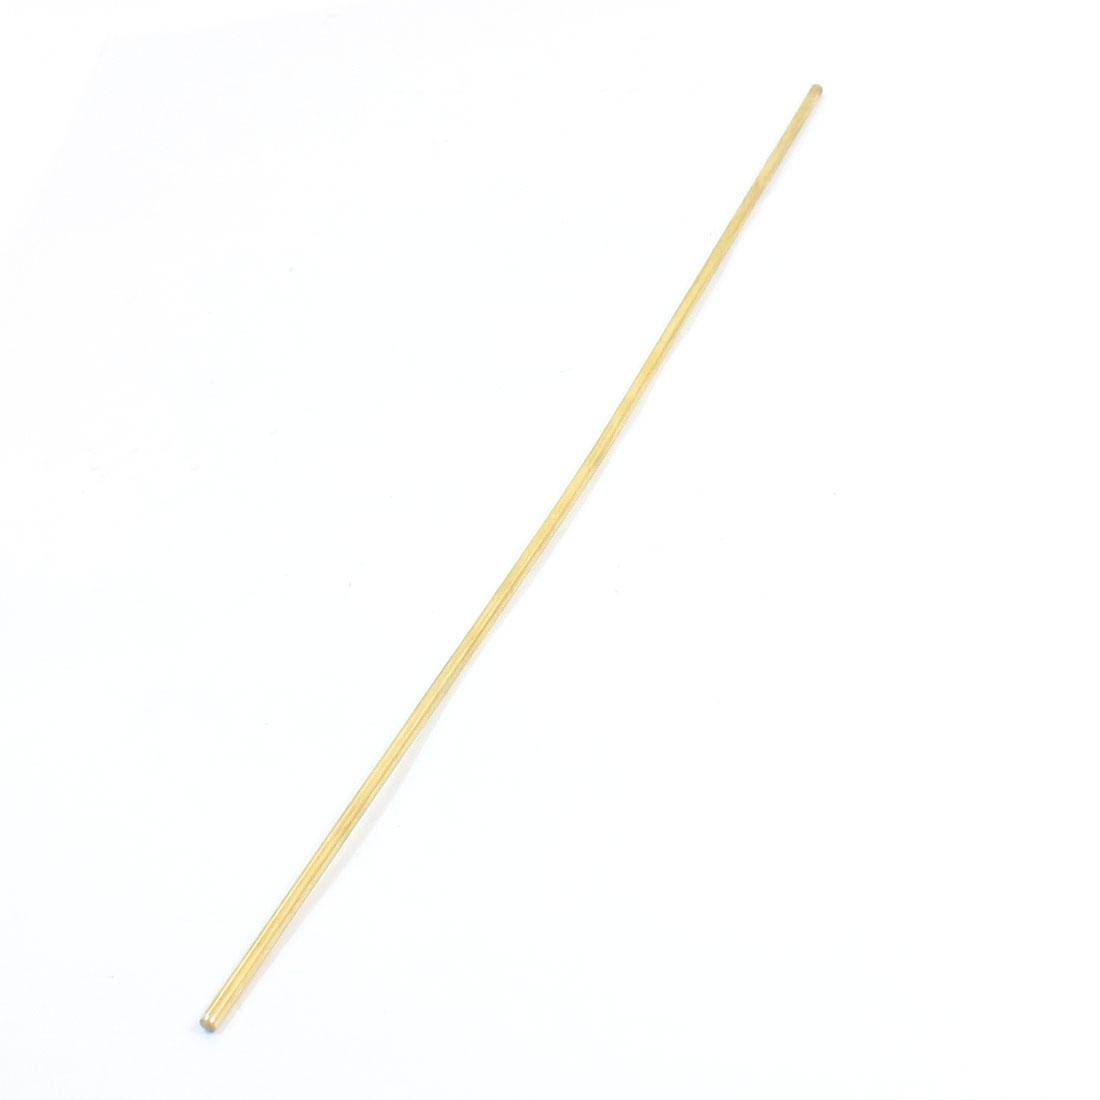 CNC Lathe Machine 300mm Length 3mm Dia Brass Axle Round Stock Rod Bar